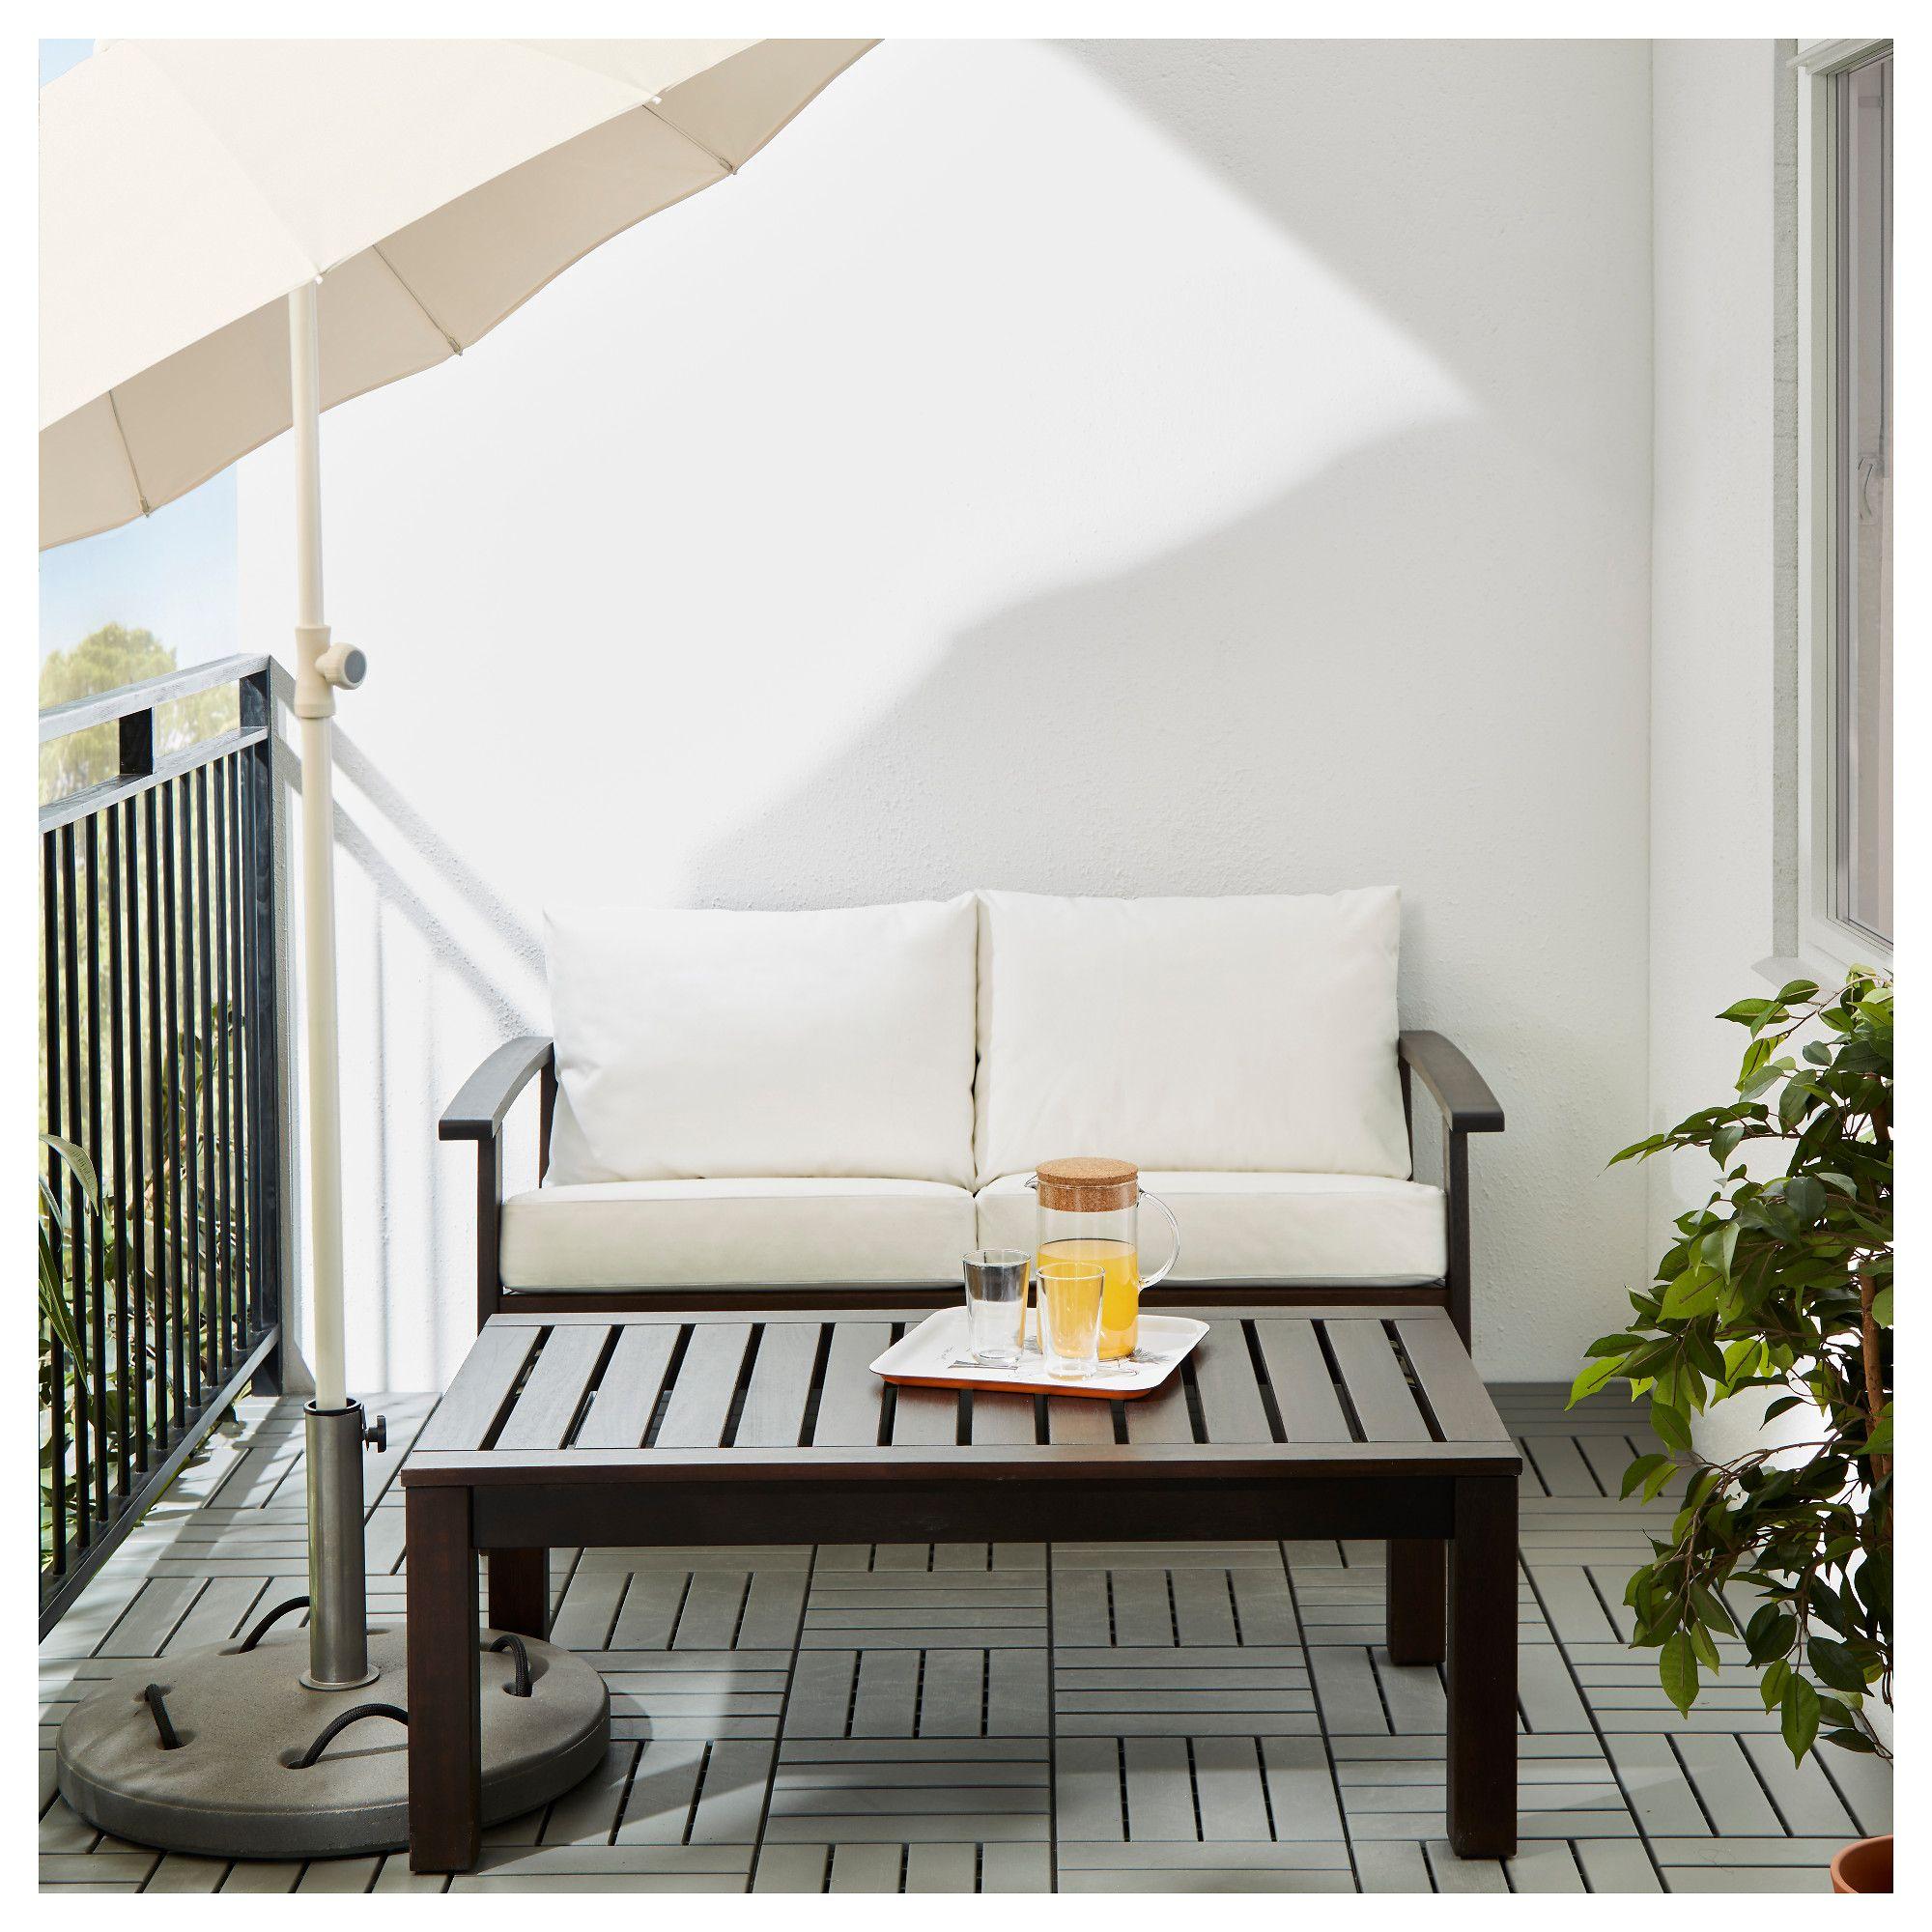 Ikea klöven loveseat outdoor brown stained white kungsö